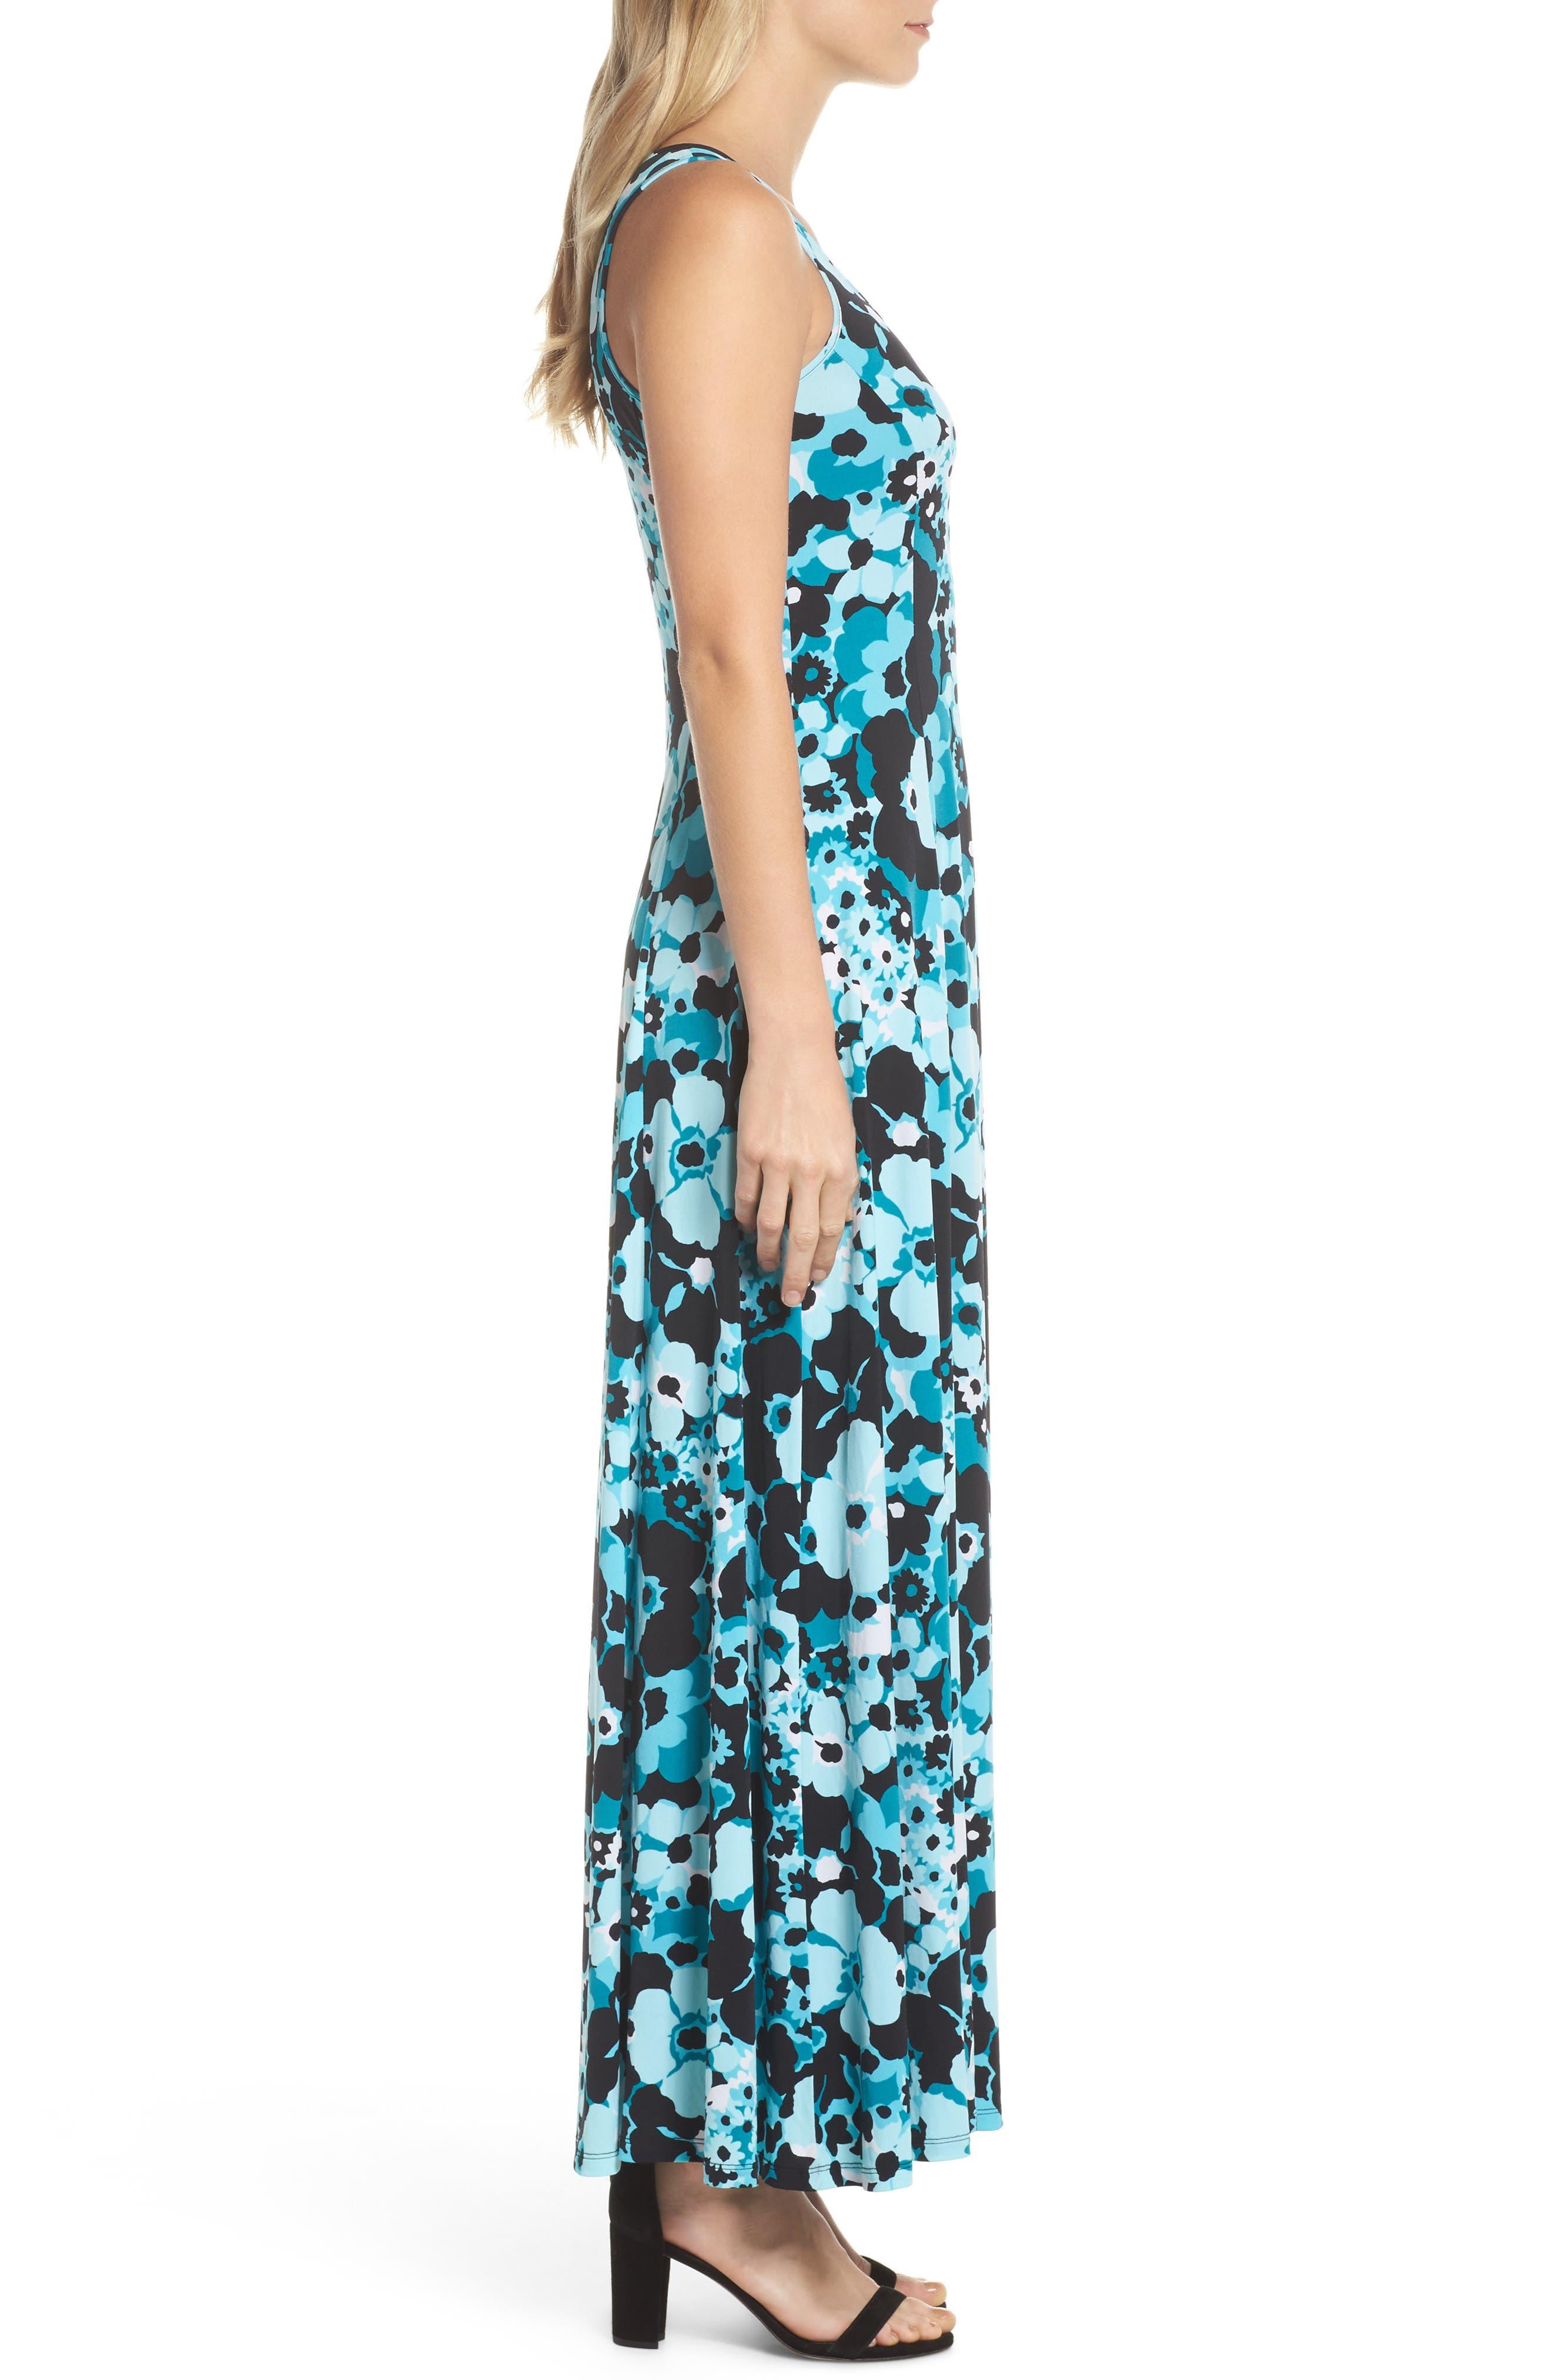 Spring Floral Maxi Dress,                             Alternate thumbnail 3, color,                             494